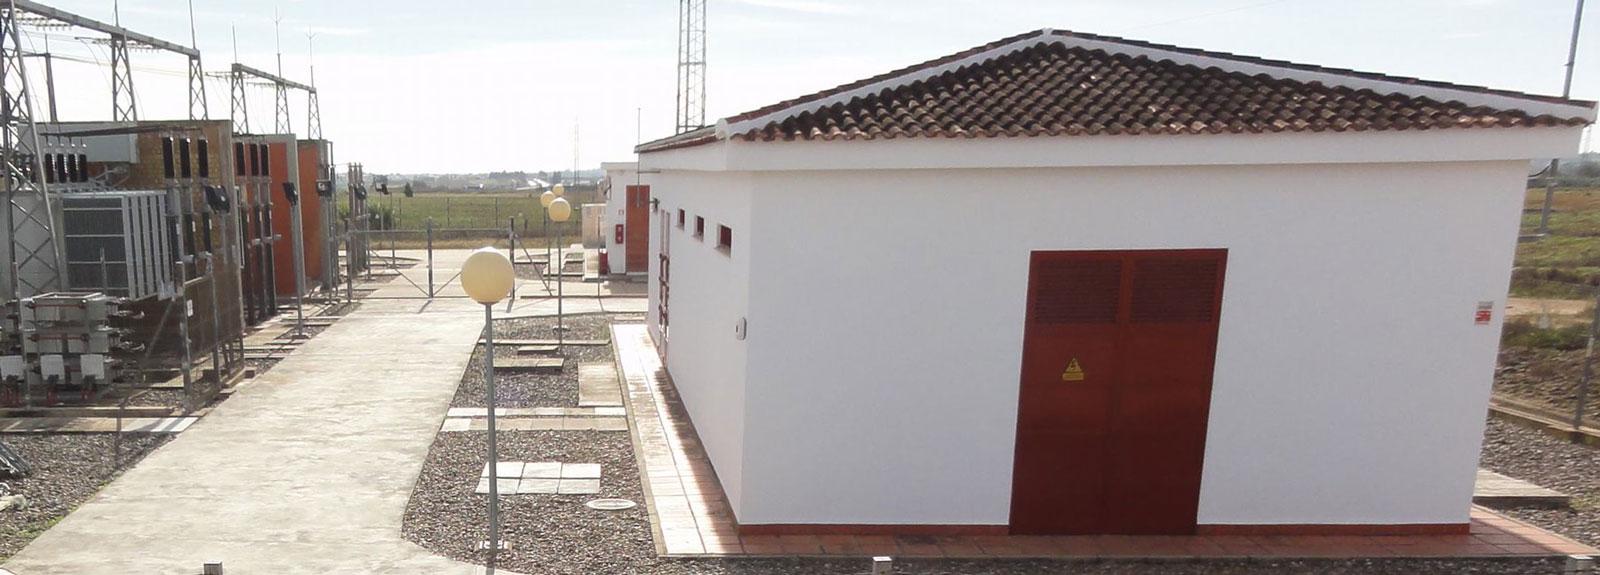 Centros de transformación - Villa Flores Martín